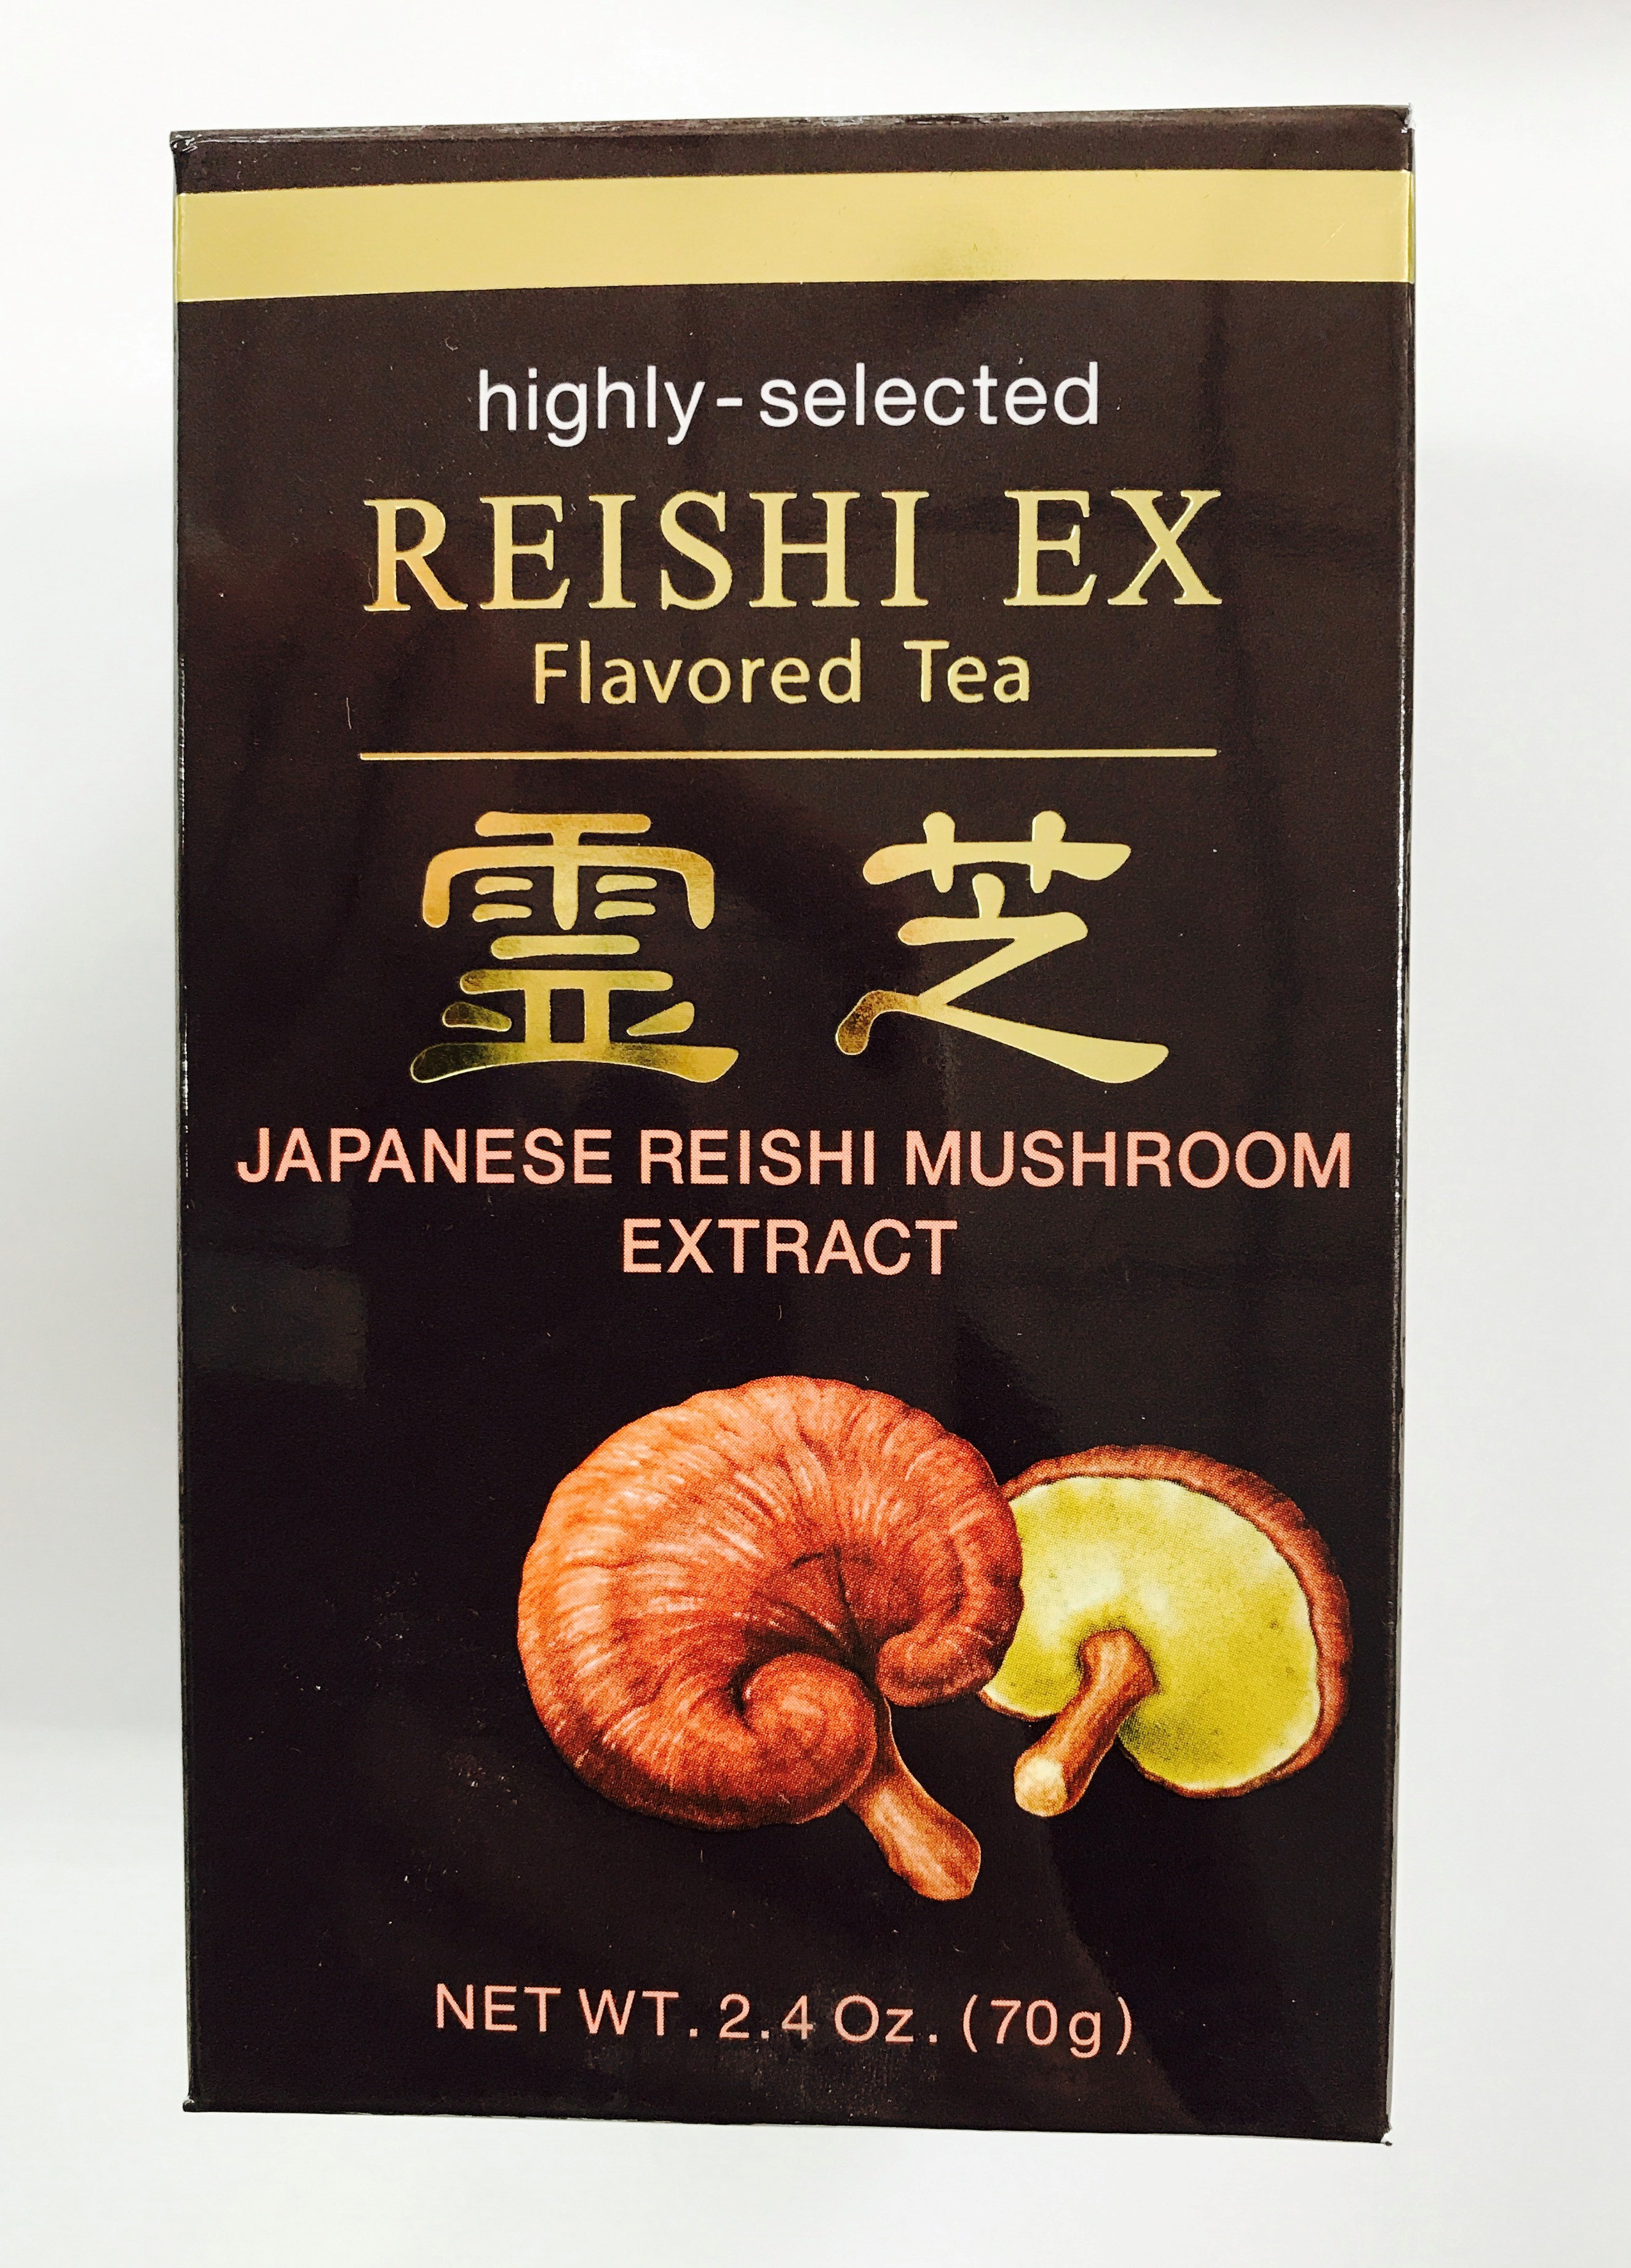 REISHI EX Flavored Tea - Japanese Reishi Mushroom Extract [Linh Chi] |  tnahouse